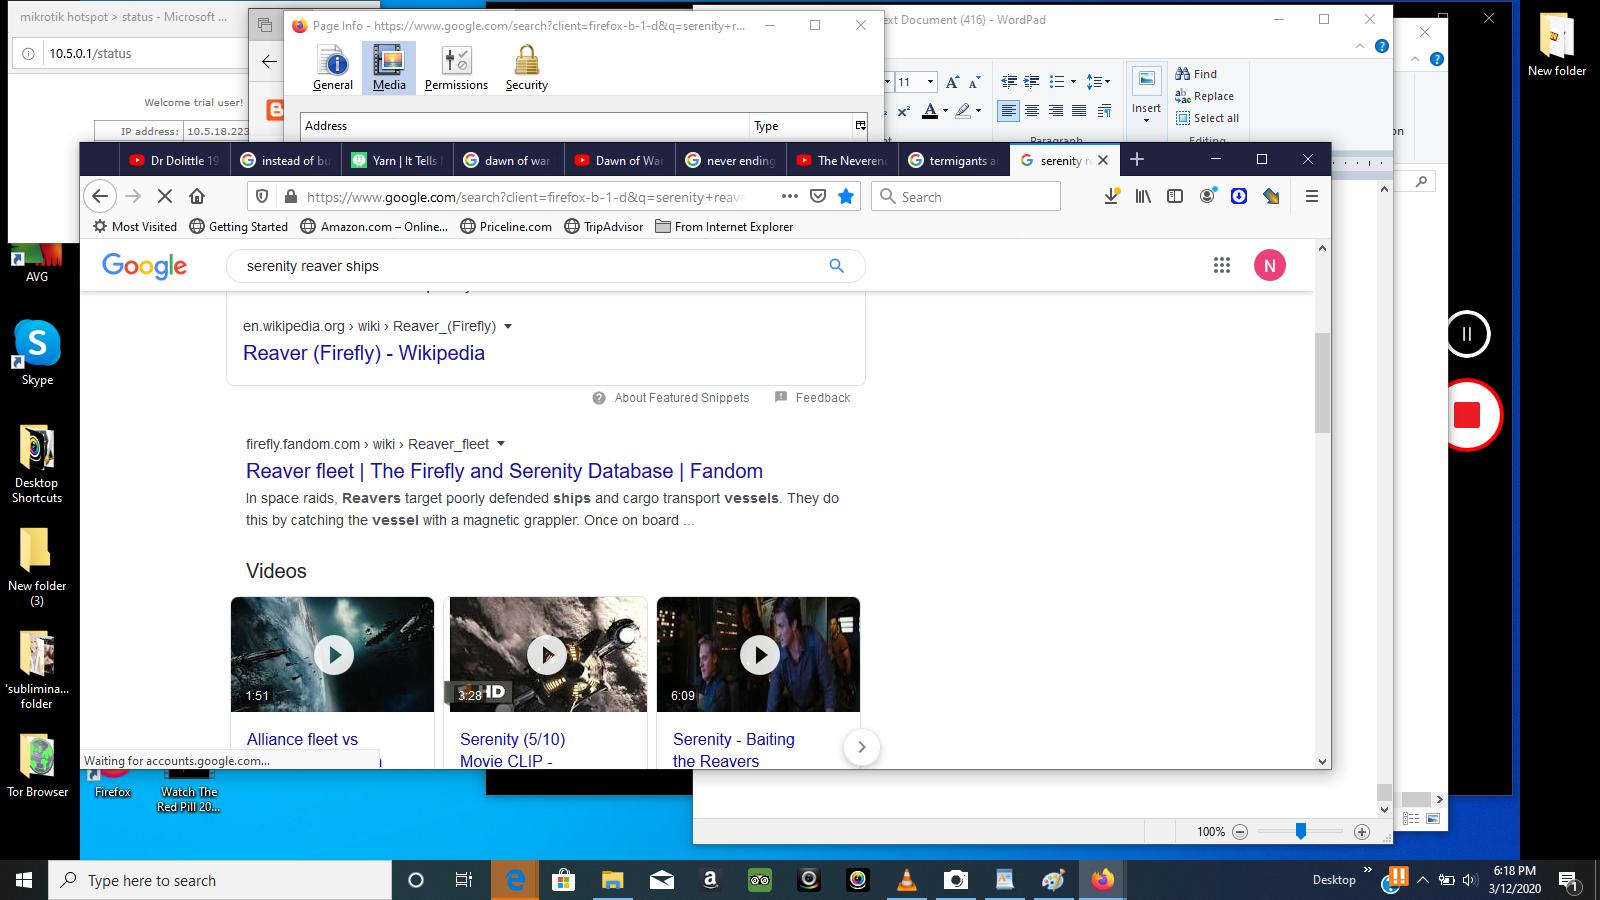 how do i upload a dvd onto my computer